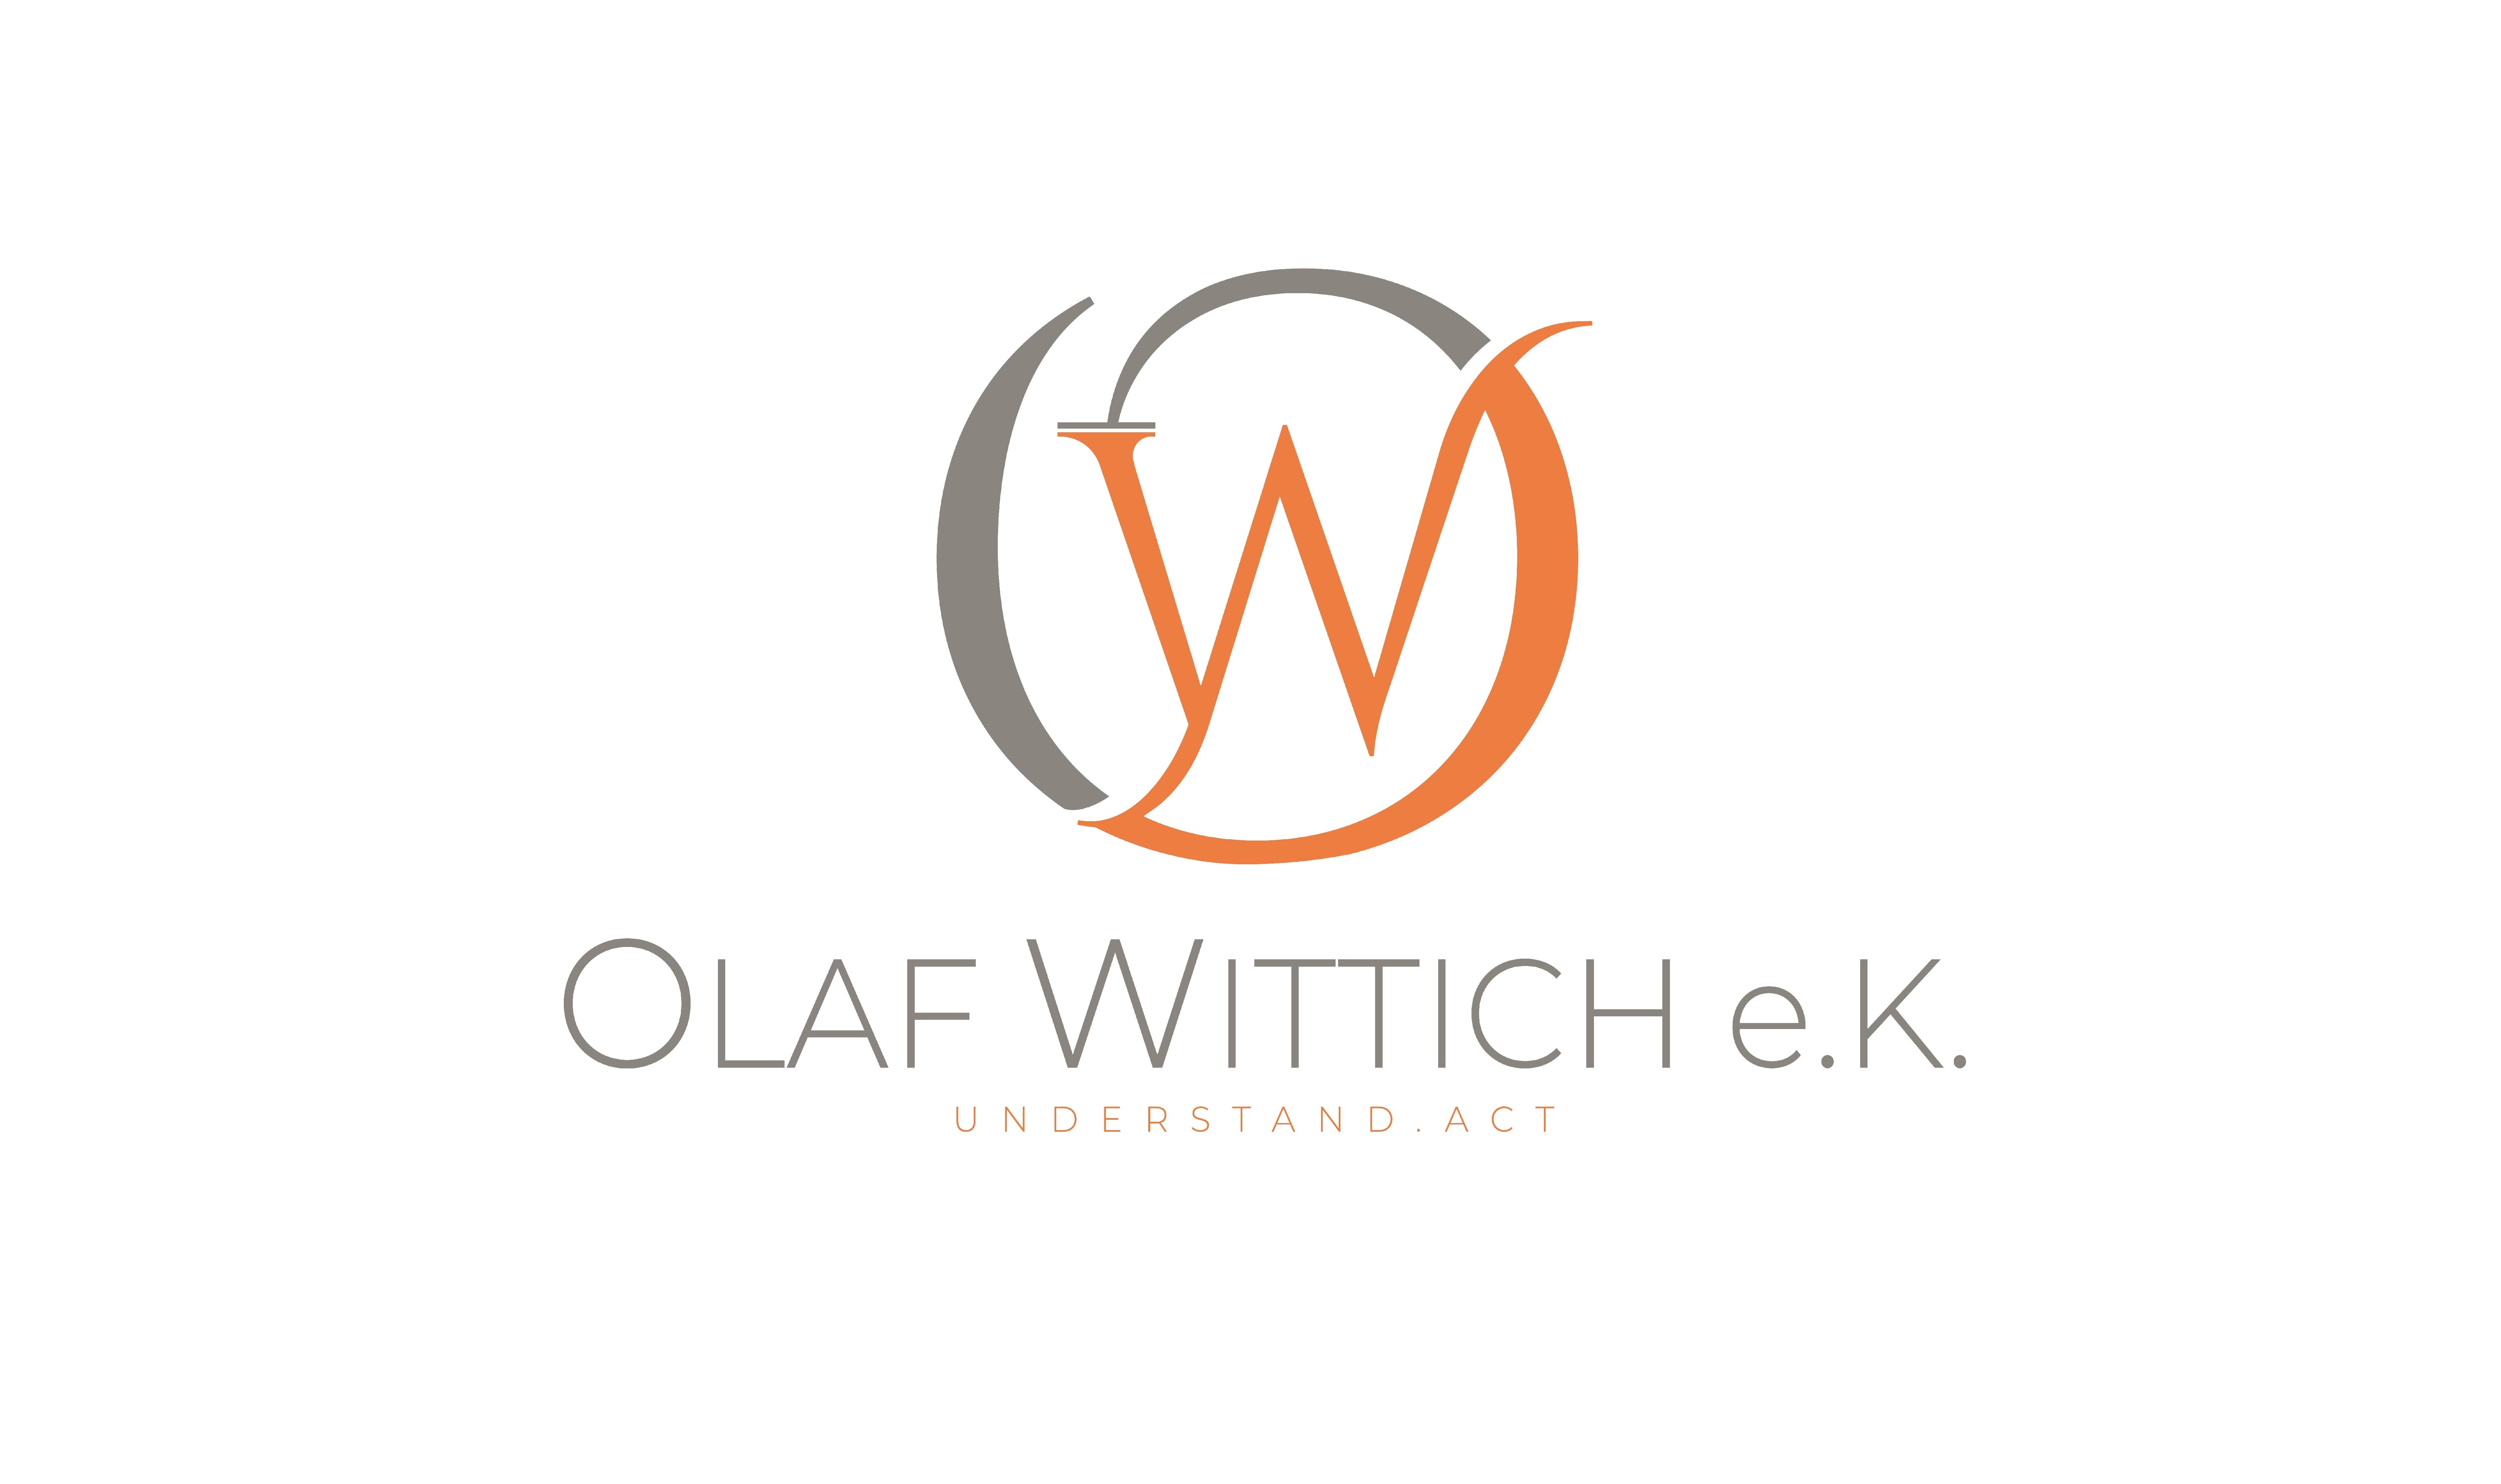 Versicherungsmakler Olaf Wittich e.K - Heidelberg Südstadt Heidelberg